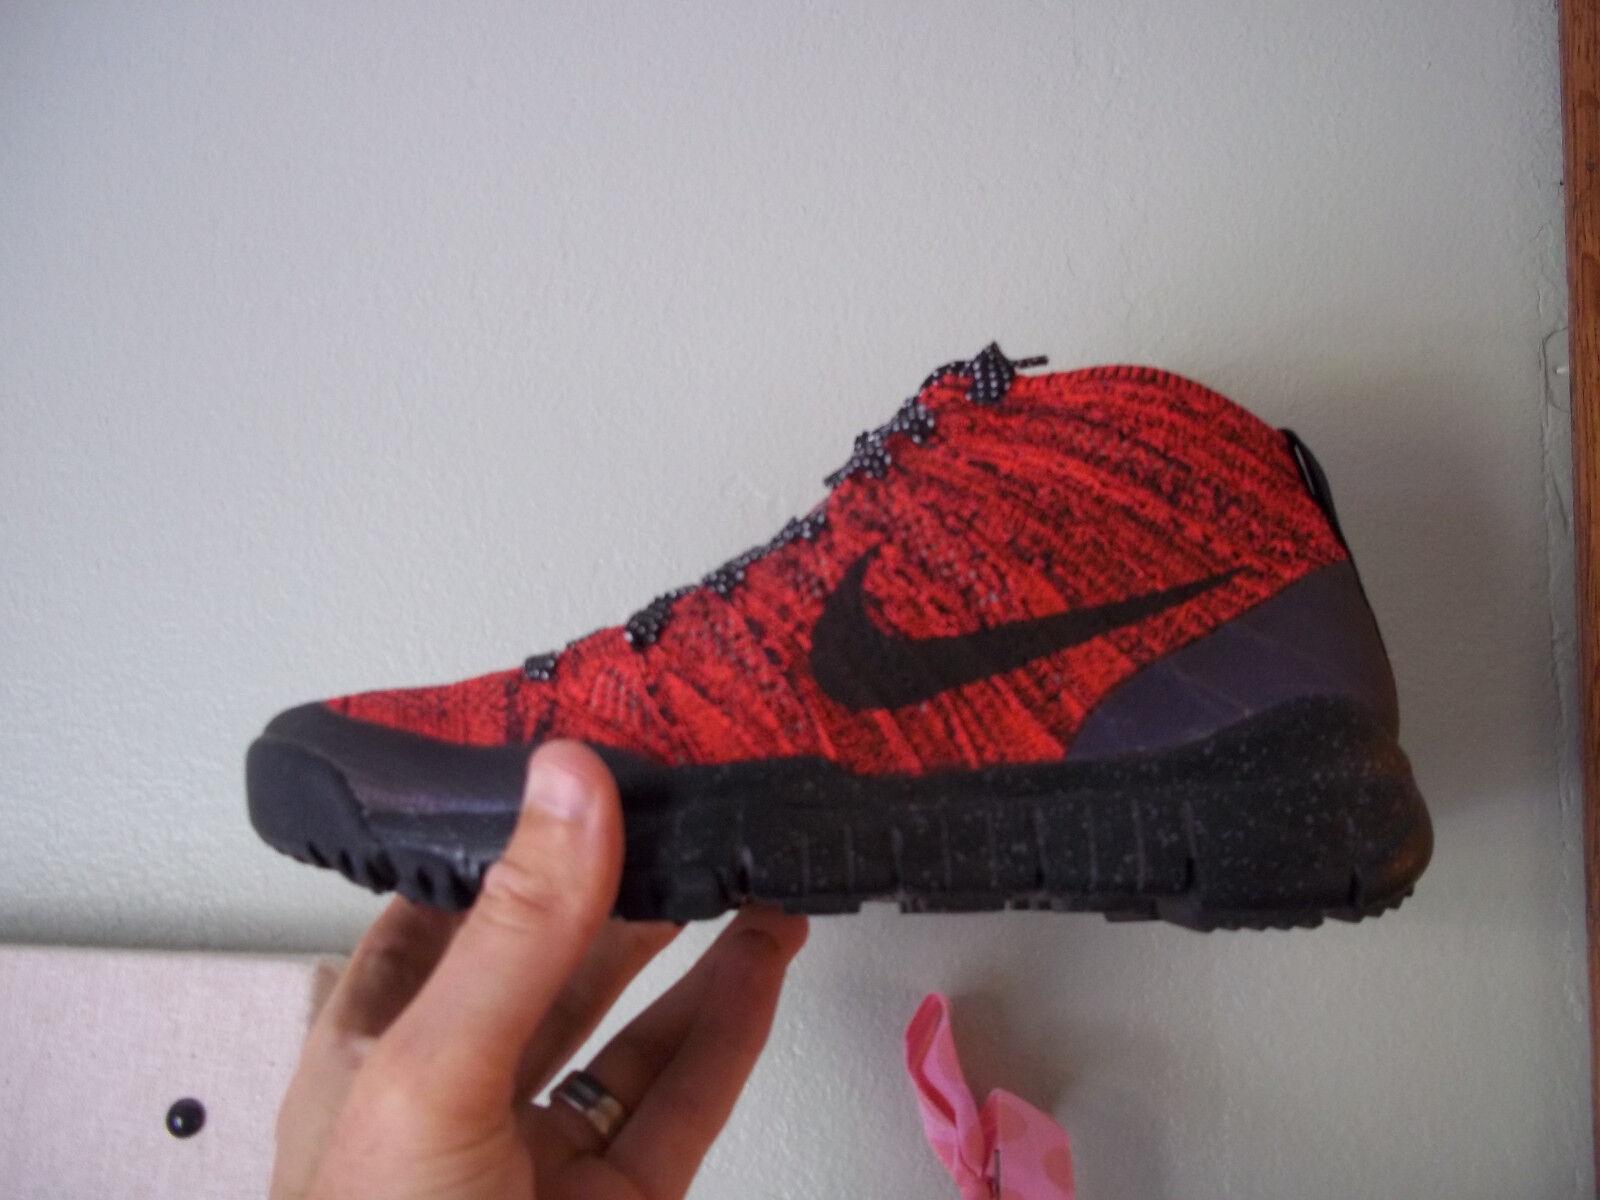 Women's Nike Flyknit Trainer Chukka FSB Size 8.5 (805093 603) NO BOX